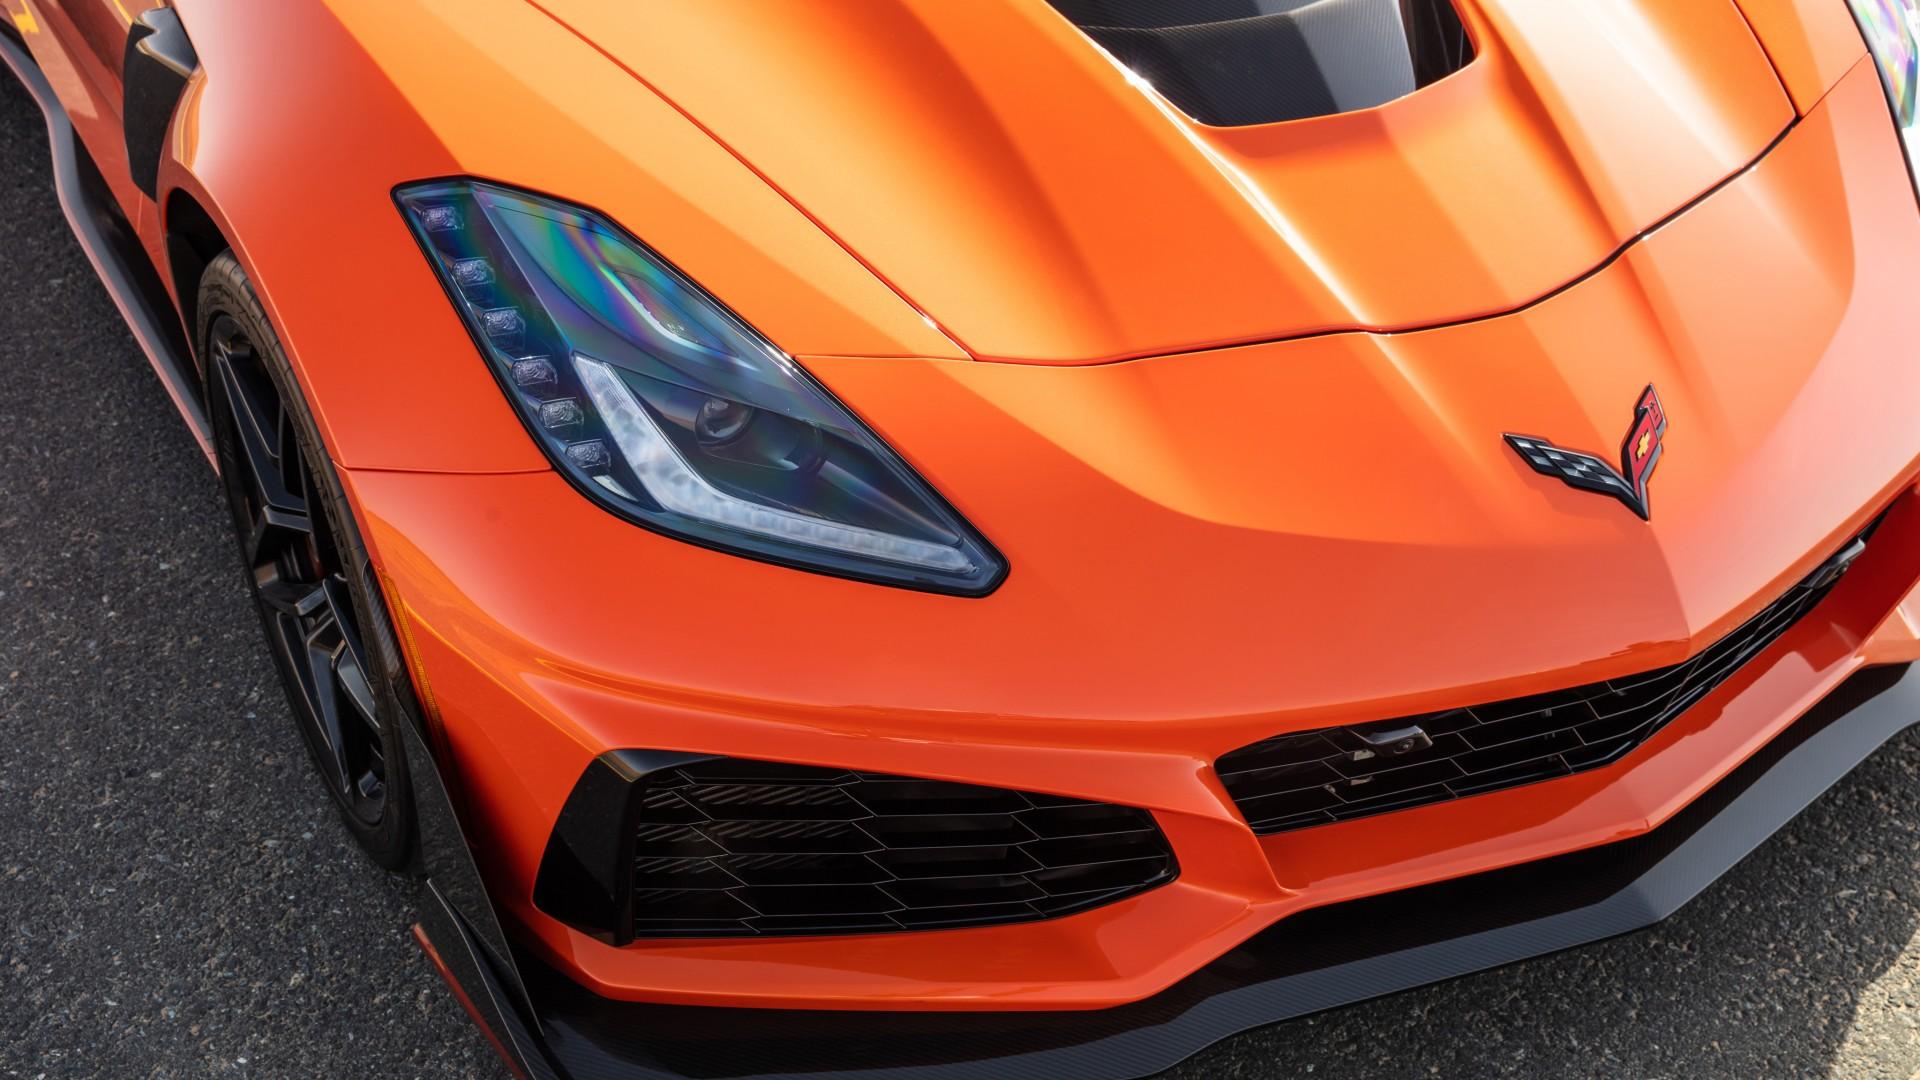 Futuristic Iphone X Wallpaper 2019 Chevrolet Corvette Zr1 4k Wallpapers Hd Wallpapers